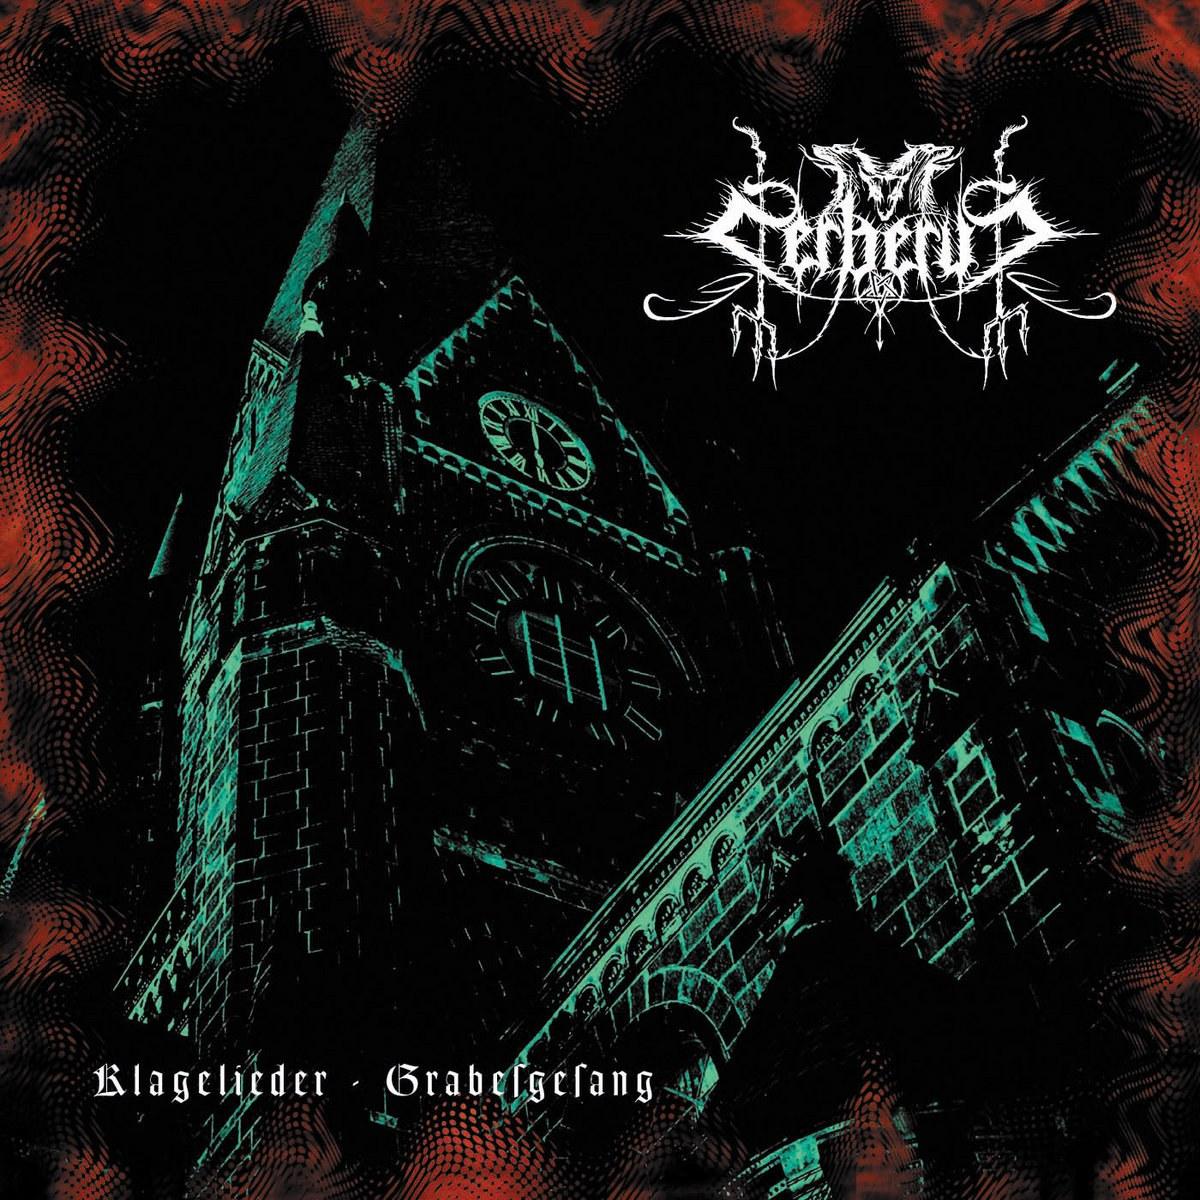 Review for Cerberus (DEU) - Klagelieder - Grabesgesang